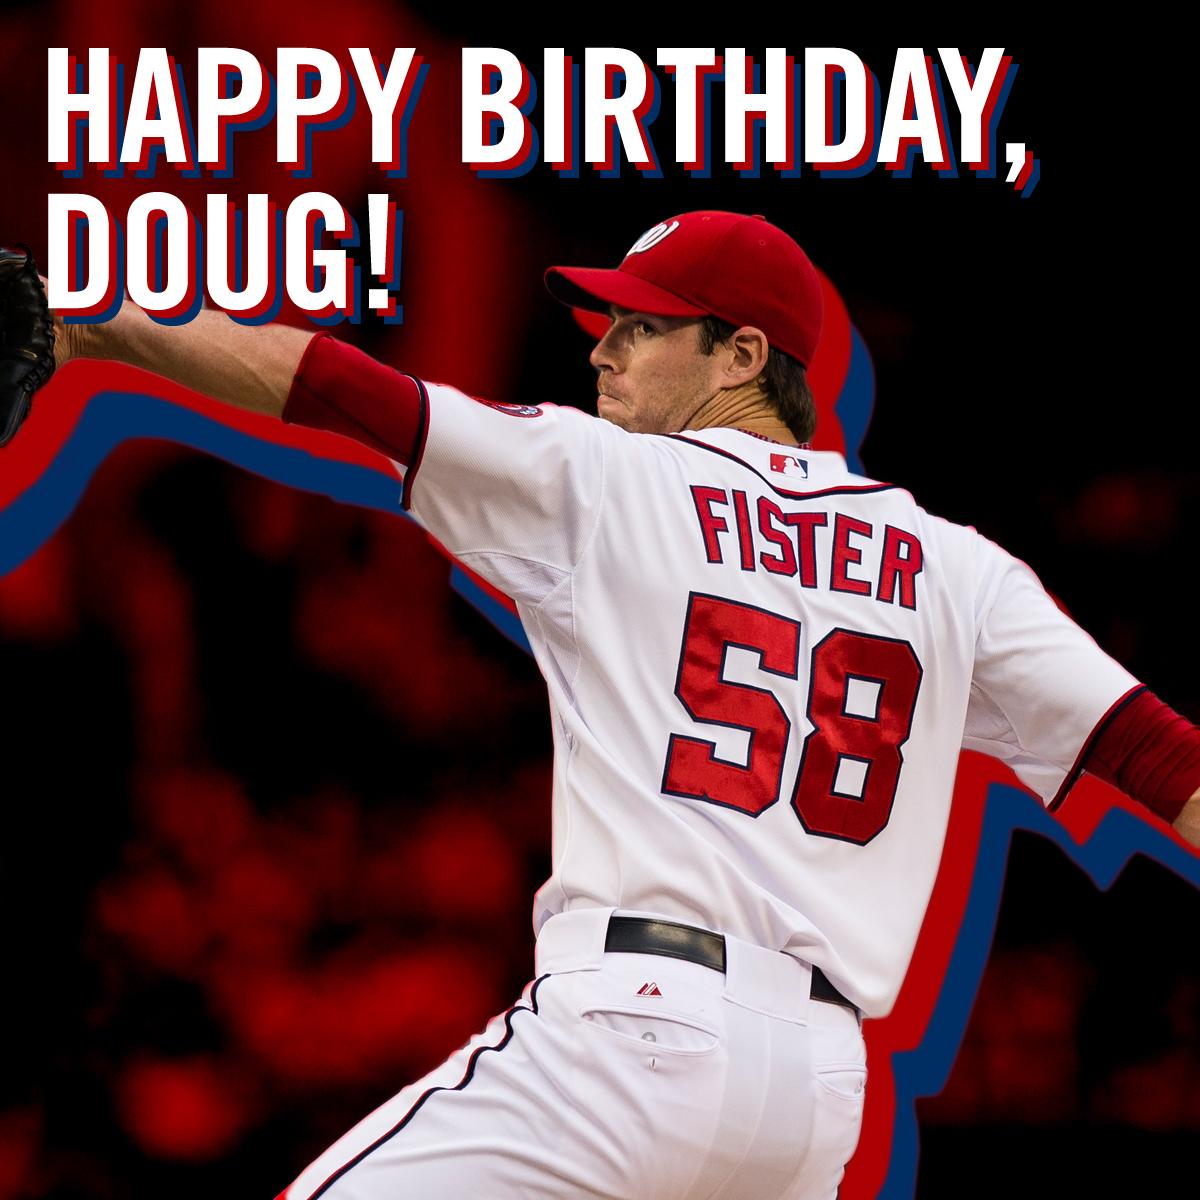 Doug Fister Instagram Birthday.jpg